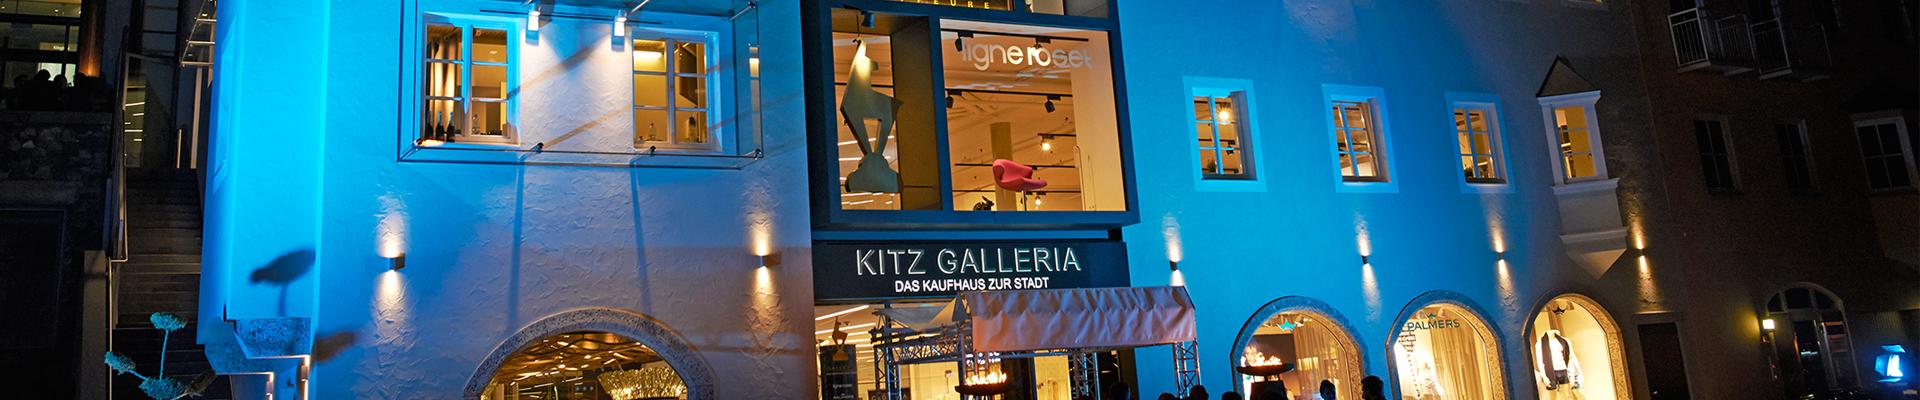 Referenz  Kitz Galleria – www.hagleitner.com 7c52e35179